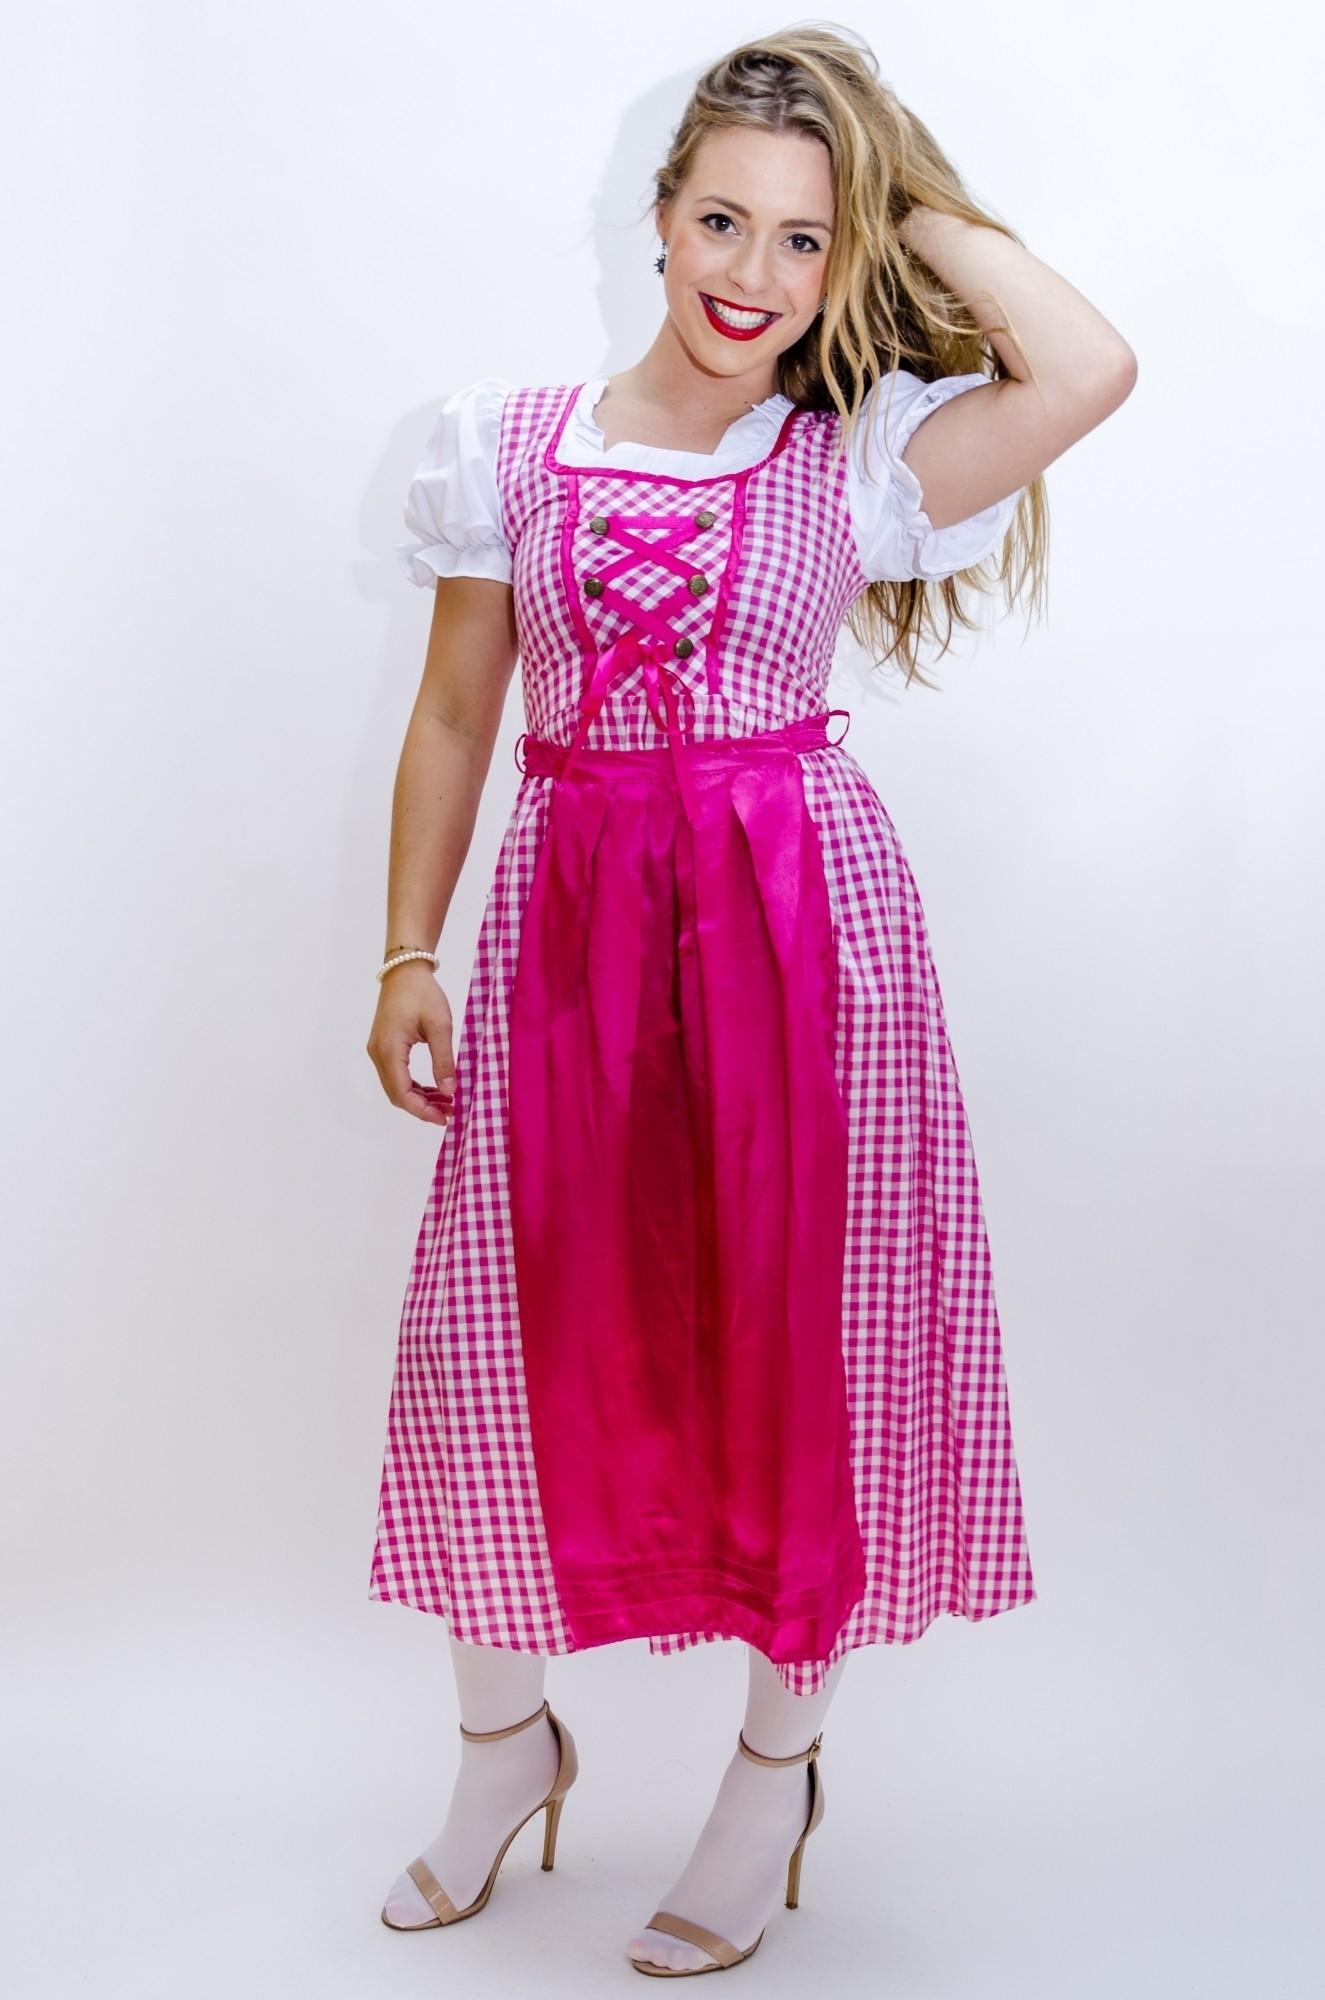 13b091dca986df Tiroler jurk lang Lena - Confettifeest.nl